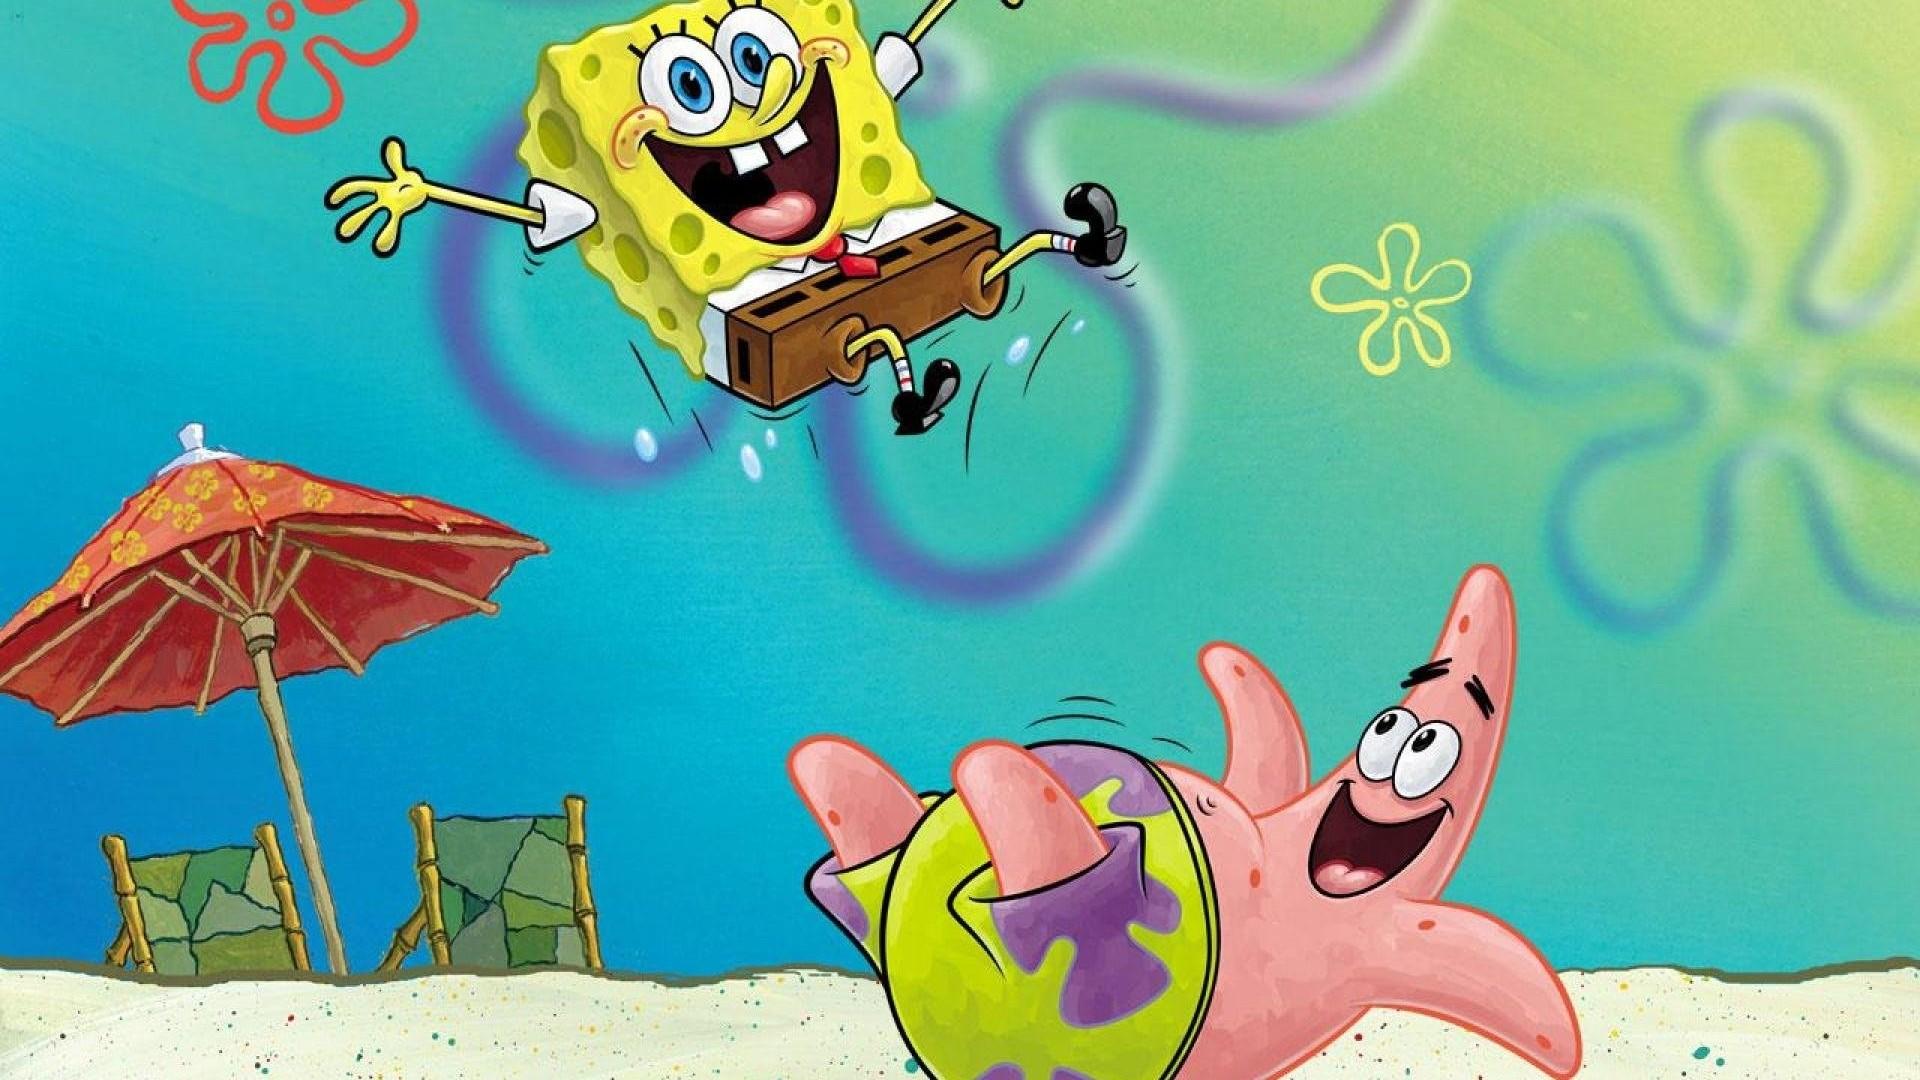 Aesthetic Spongebob HD Wallpaper